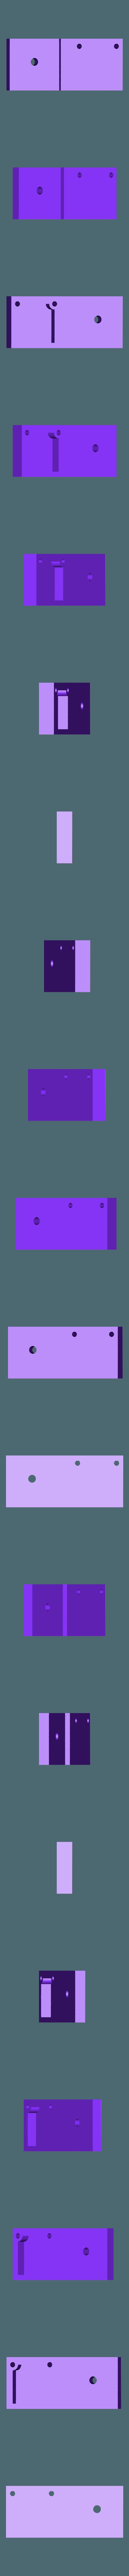 Supporto_fine_corsa_Asse_Z_U30_Orizz.stl Download free STL file Alfawise U30 Z Stop • Model to 3D print, Scigola